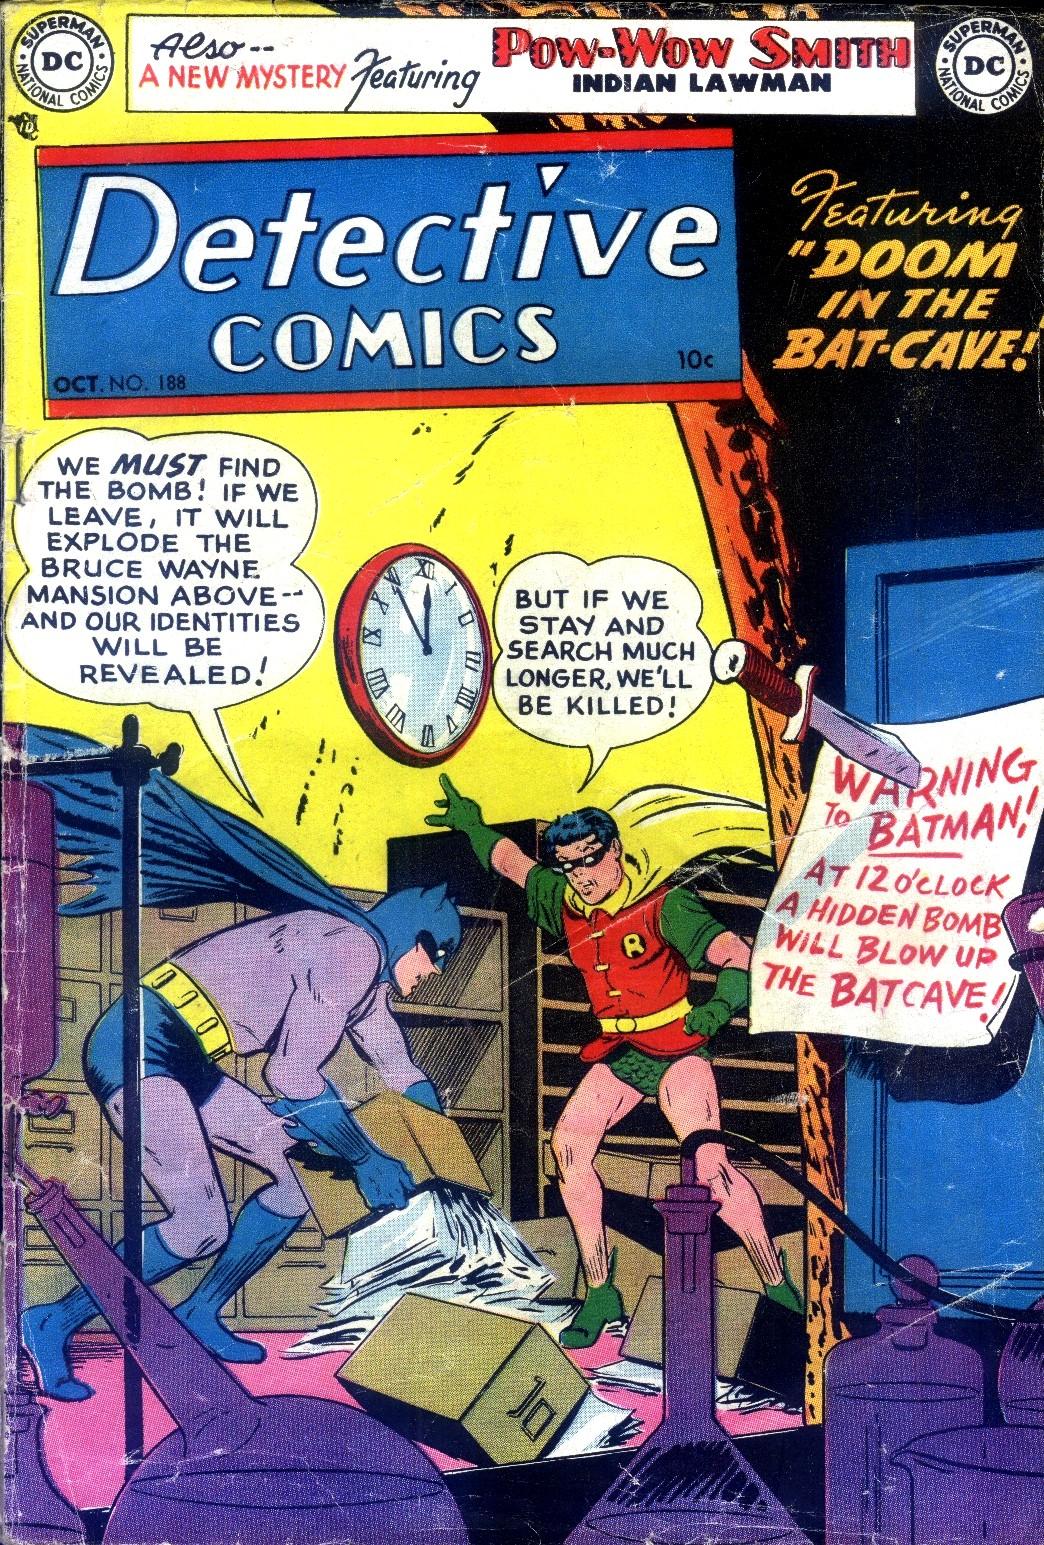 Read online Detective Comics (1937) comic -  Issue #188 - 1